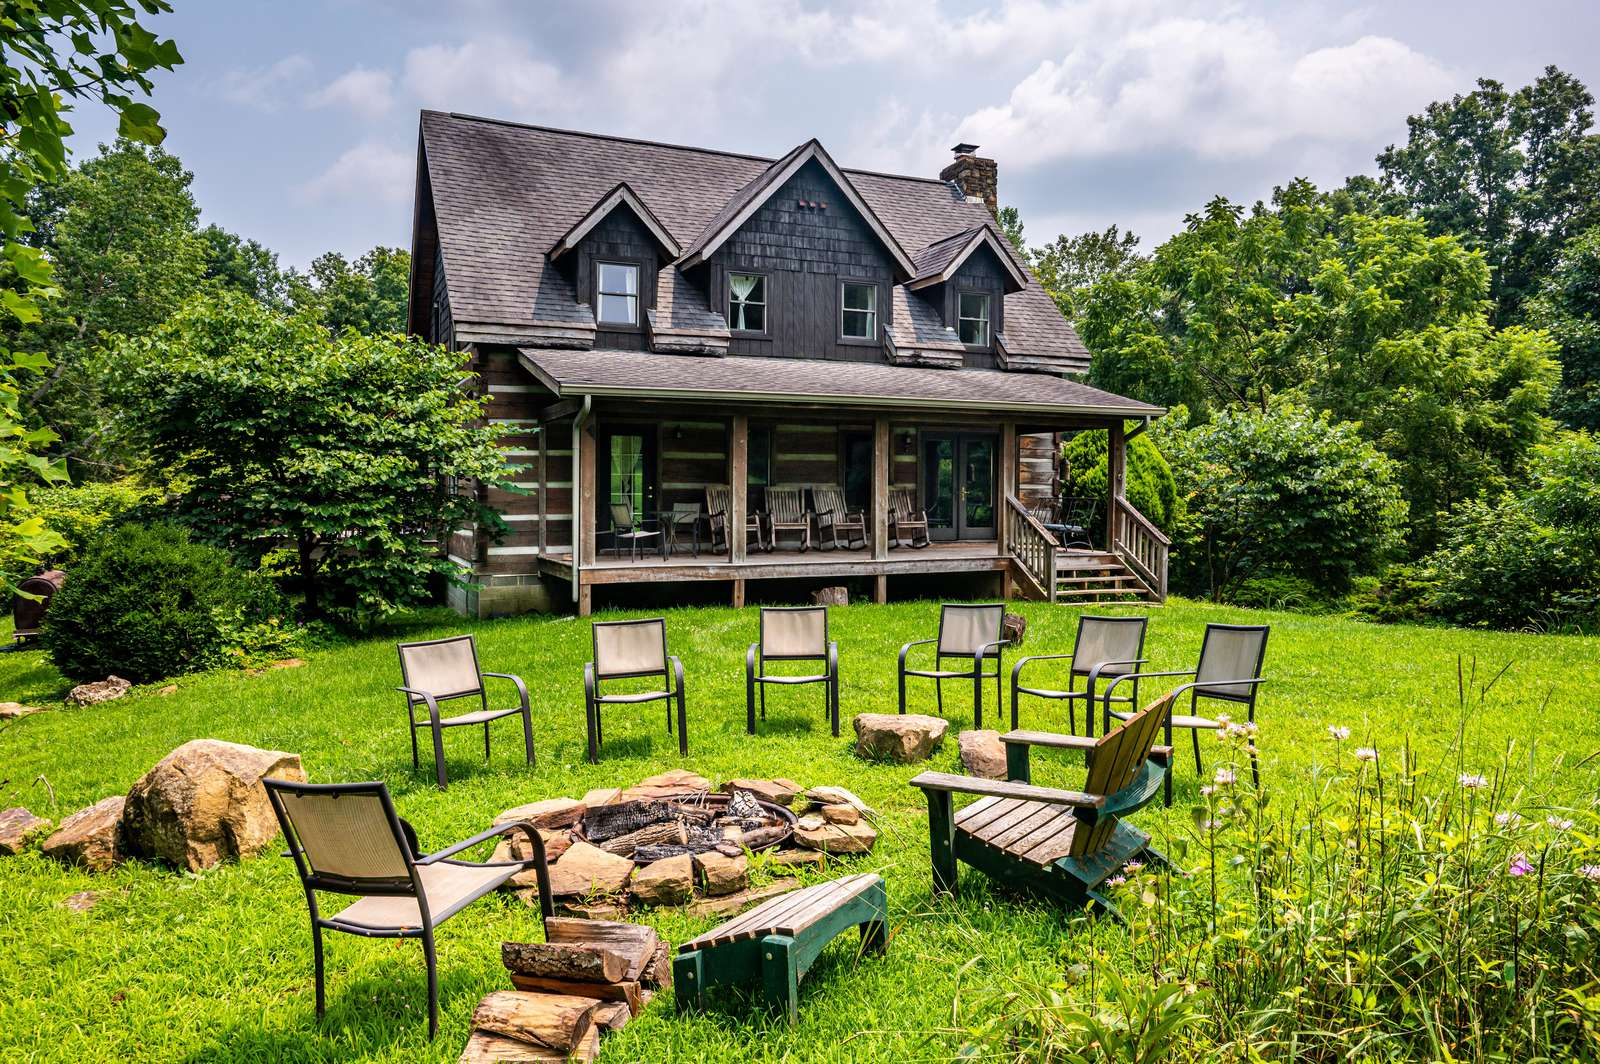 Twin Oaks Lodge Vacation Cabin - property